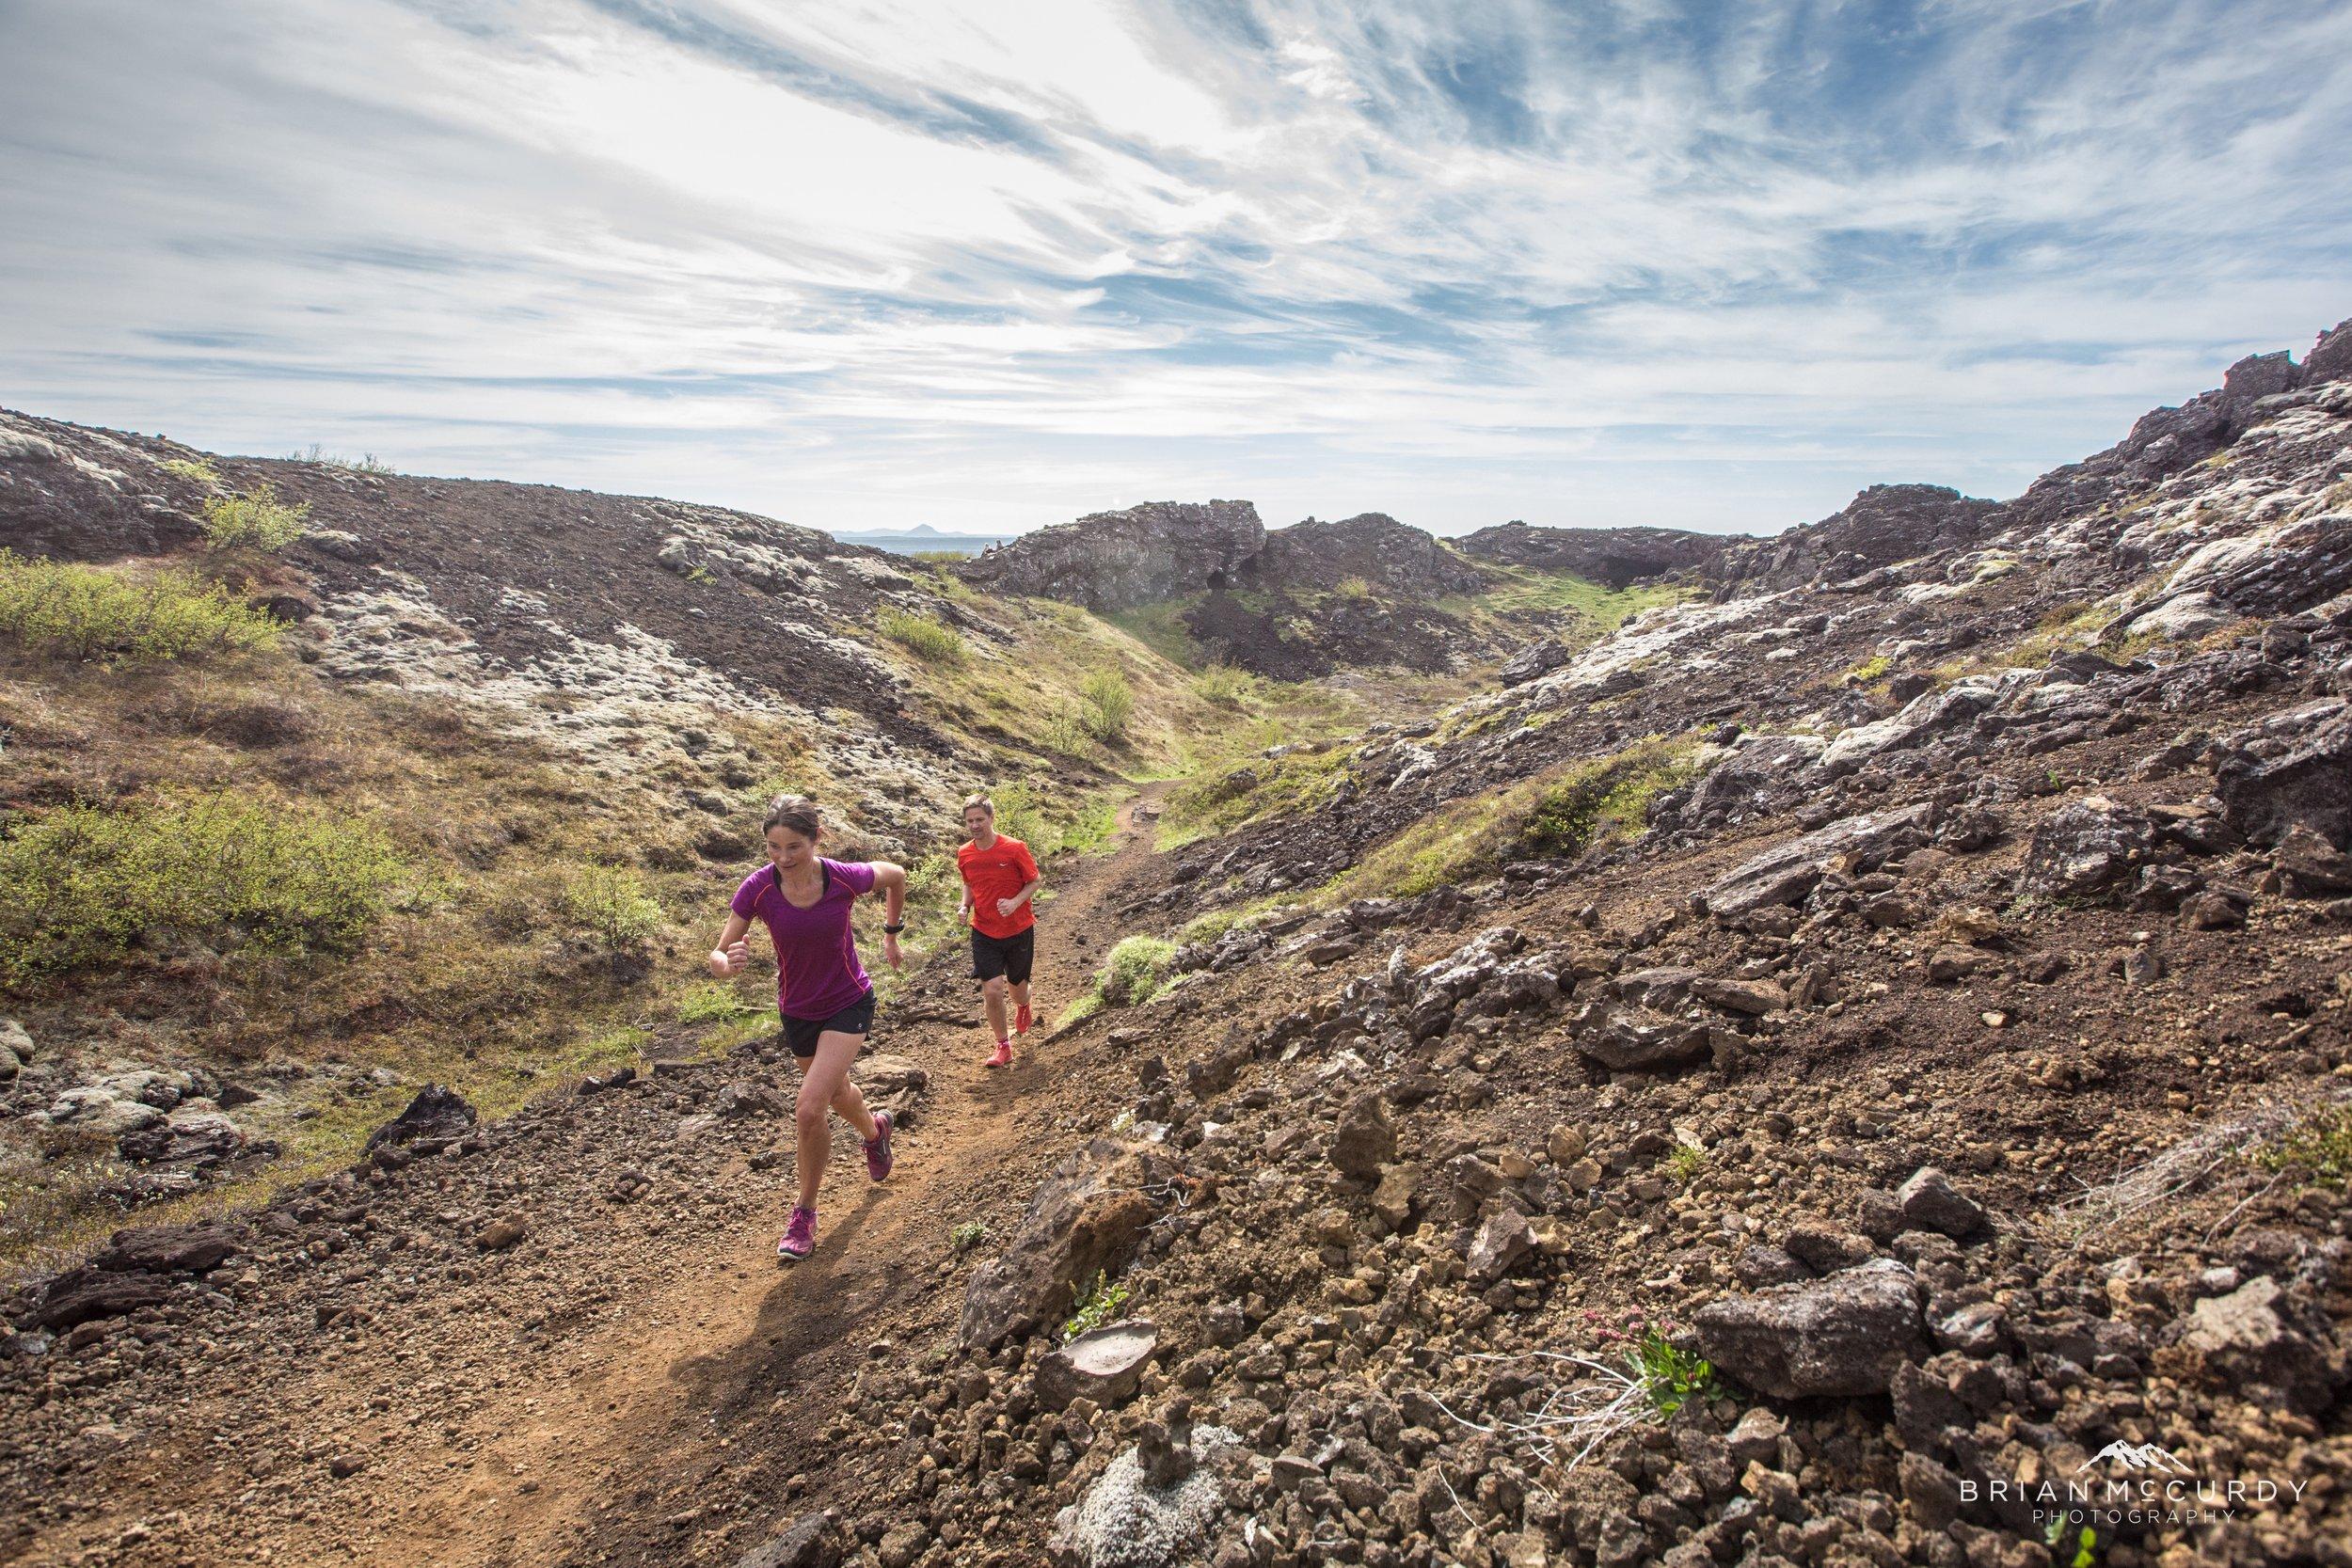 Iceland adventure running retreat   Breathtaking trail running